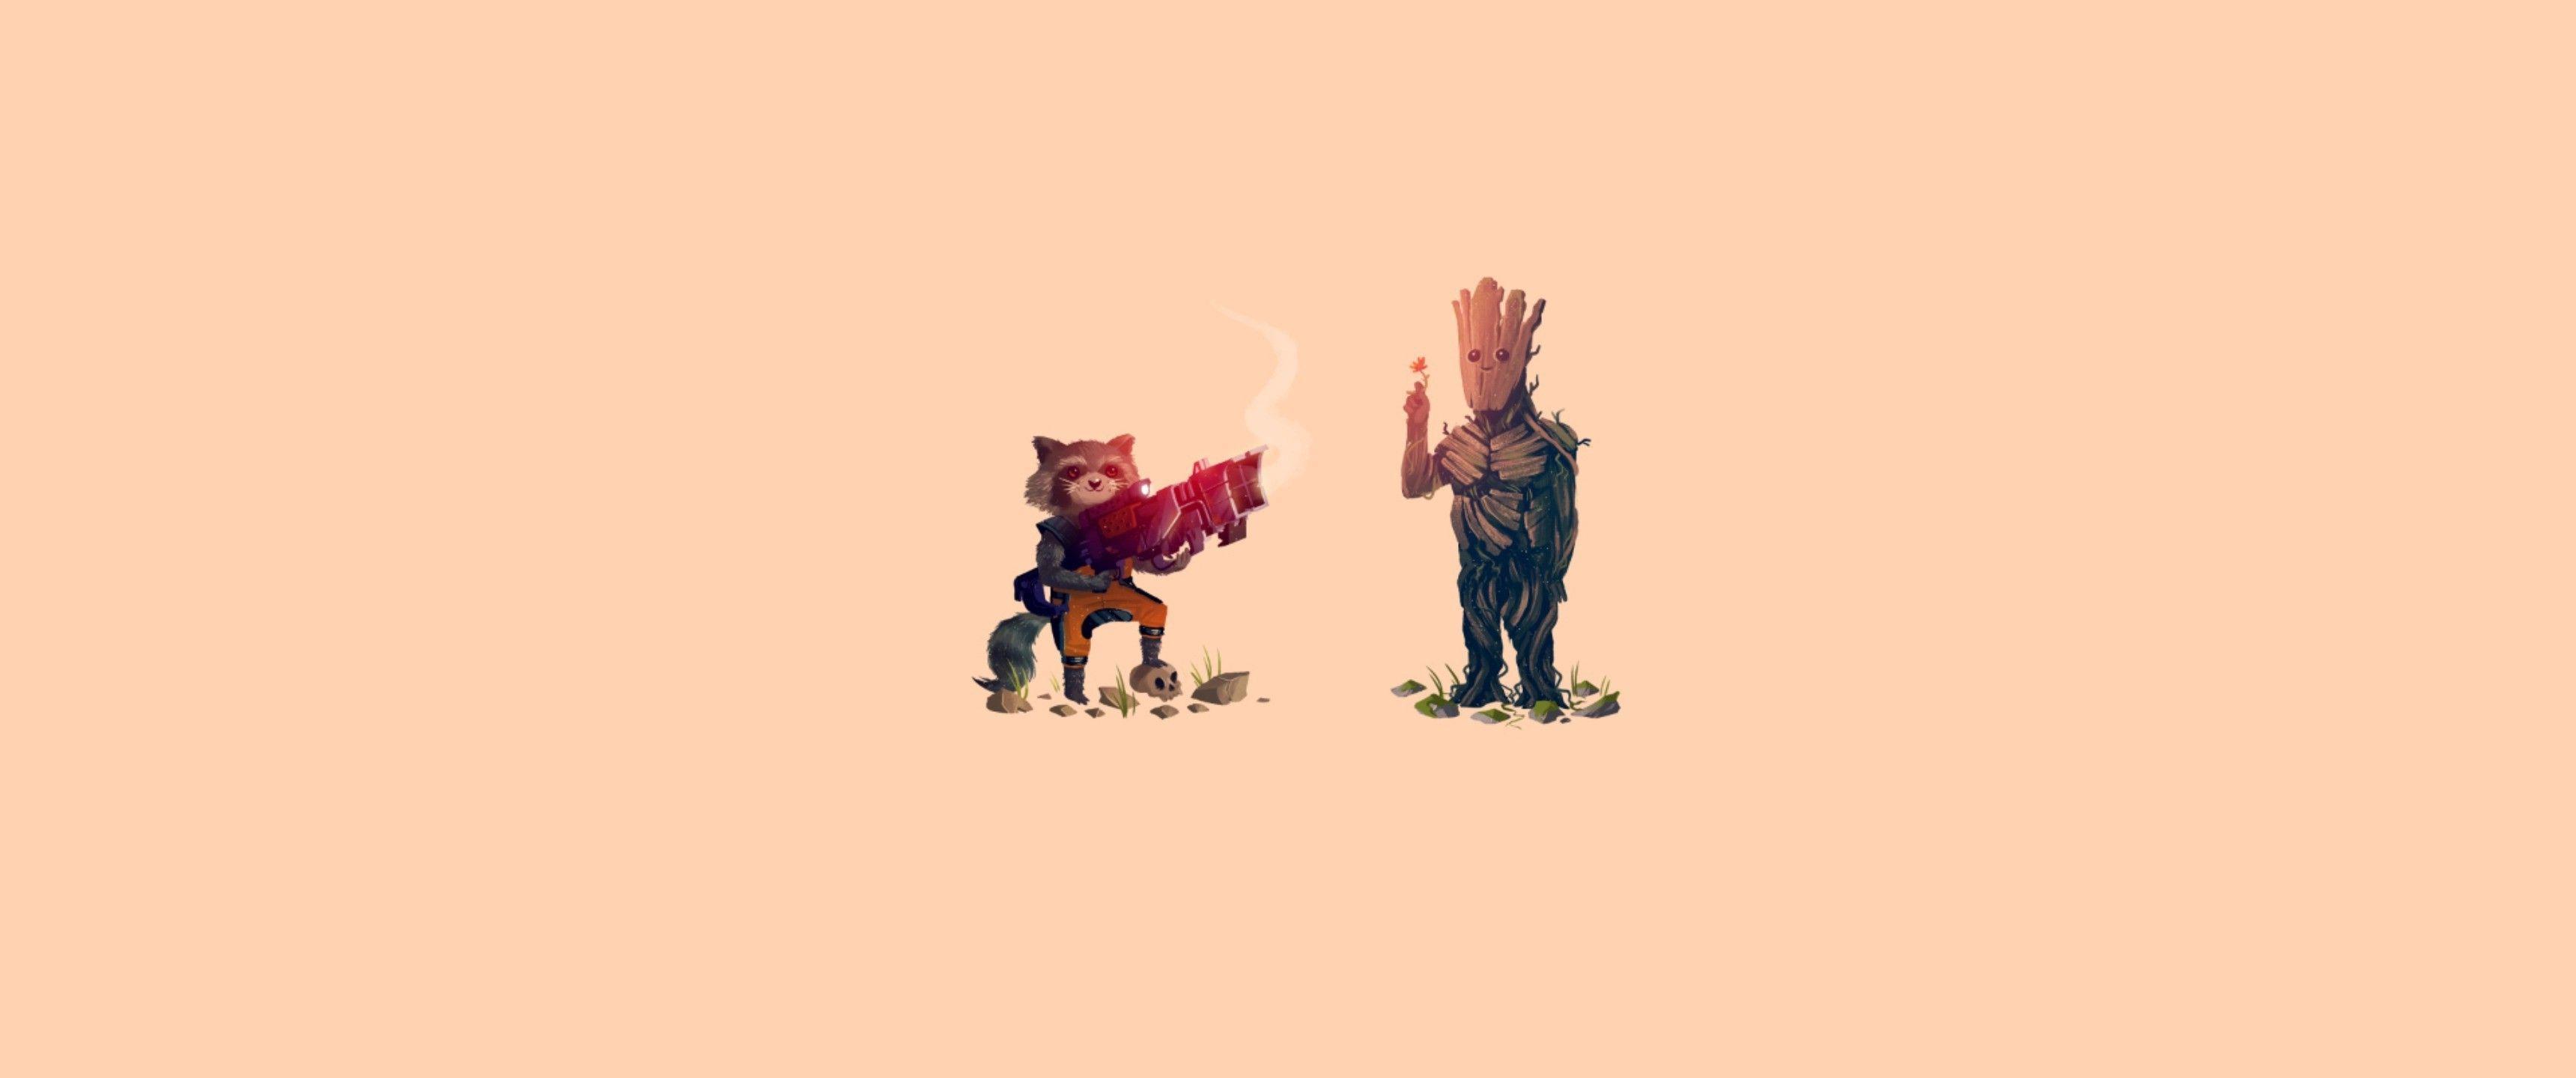 Guardians Of The Galaxy, Groot, Rocket Raccoon Wallpapers HD ...